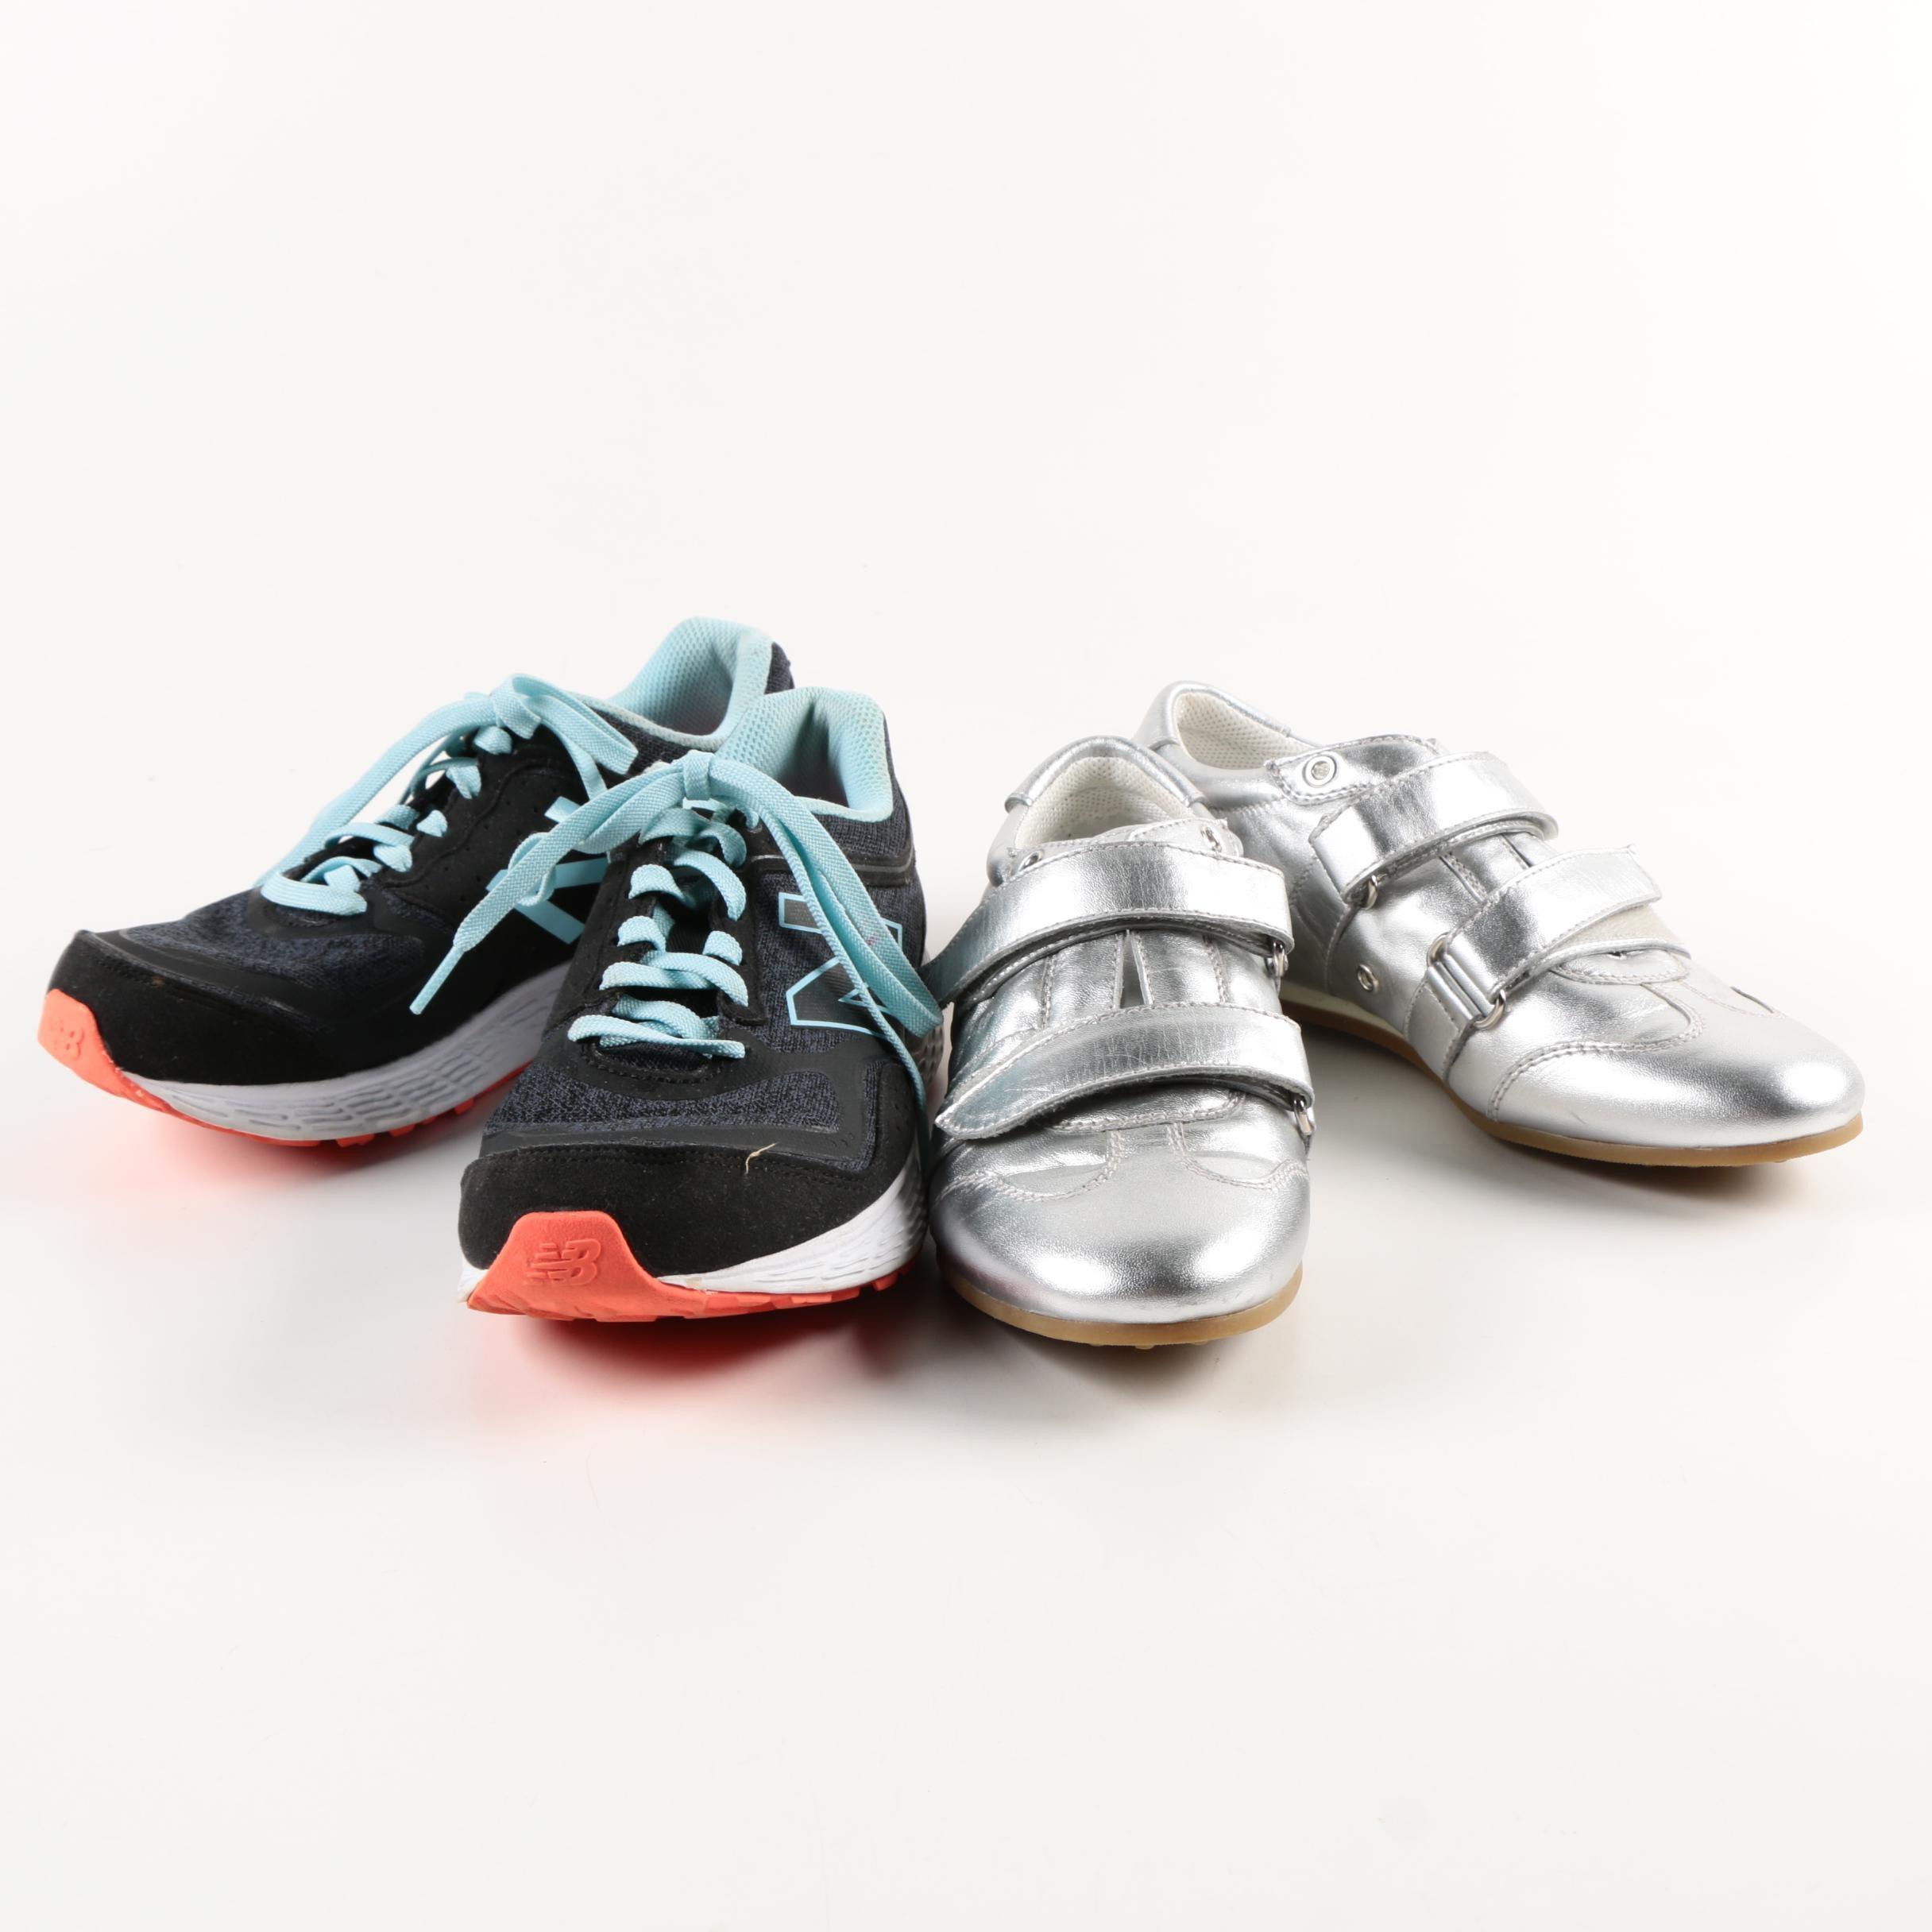 Women's Sneakers Including Original Car Shoe